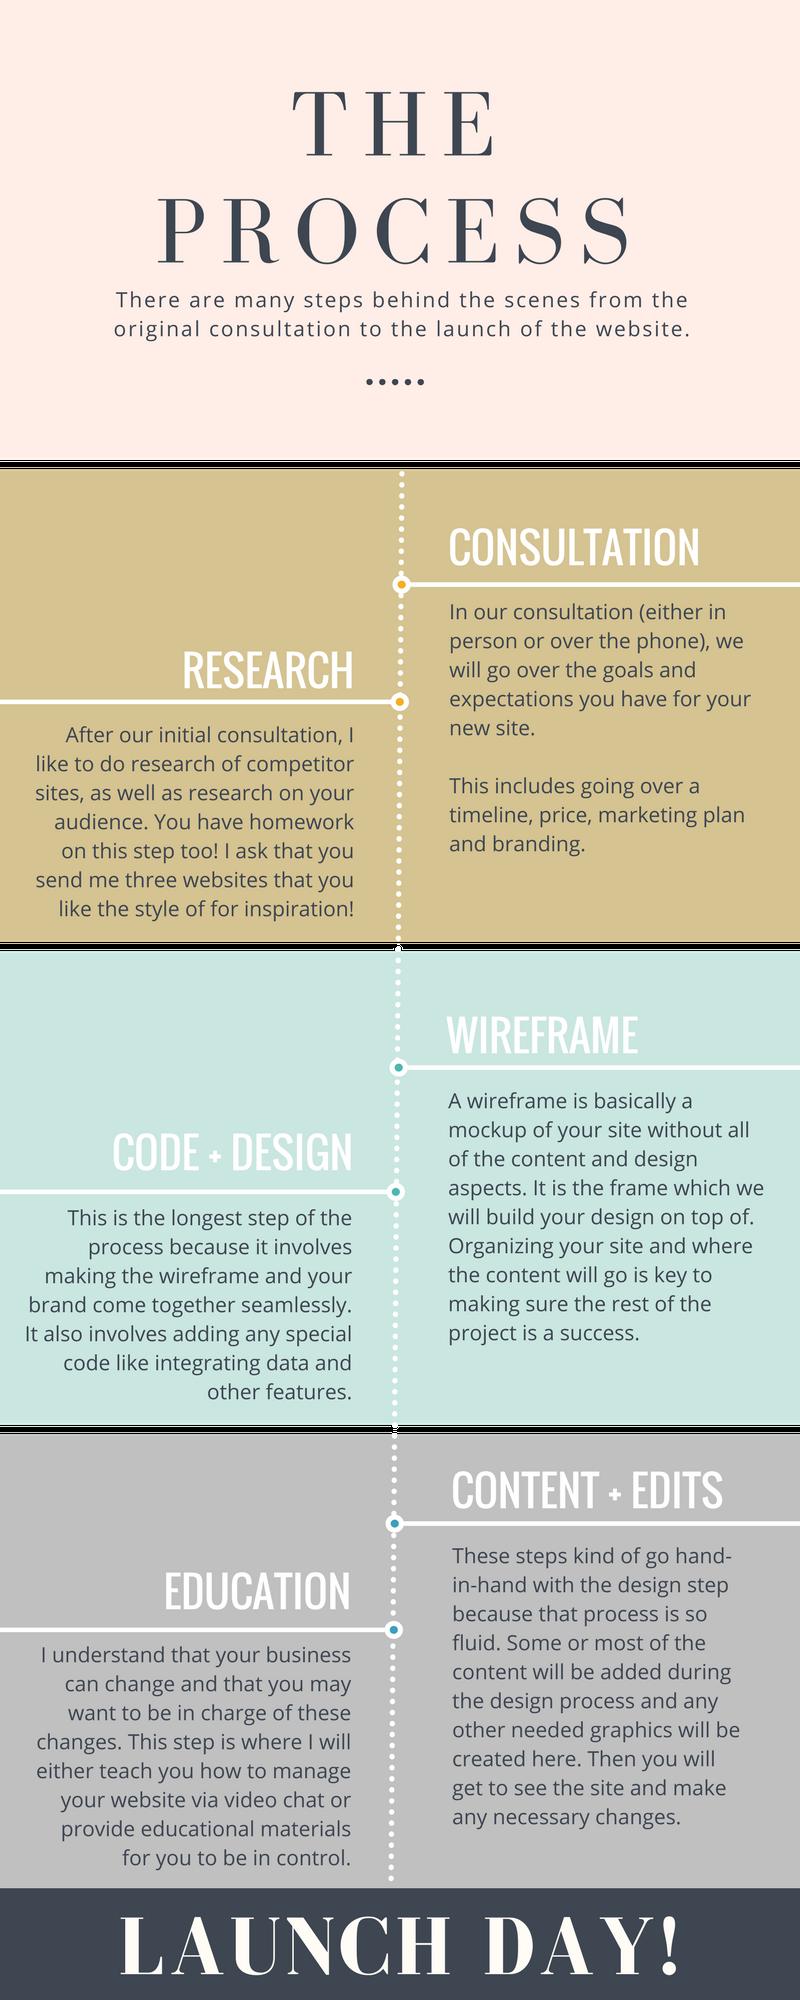 amor paloma designs web design process knoxville web design